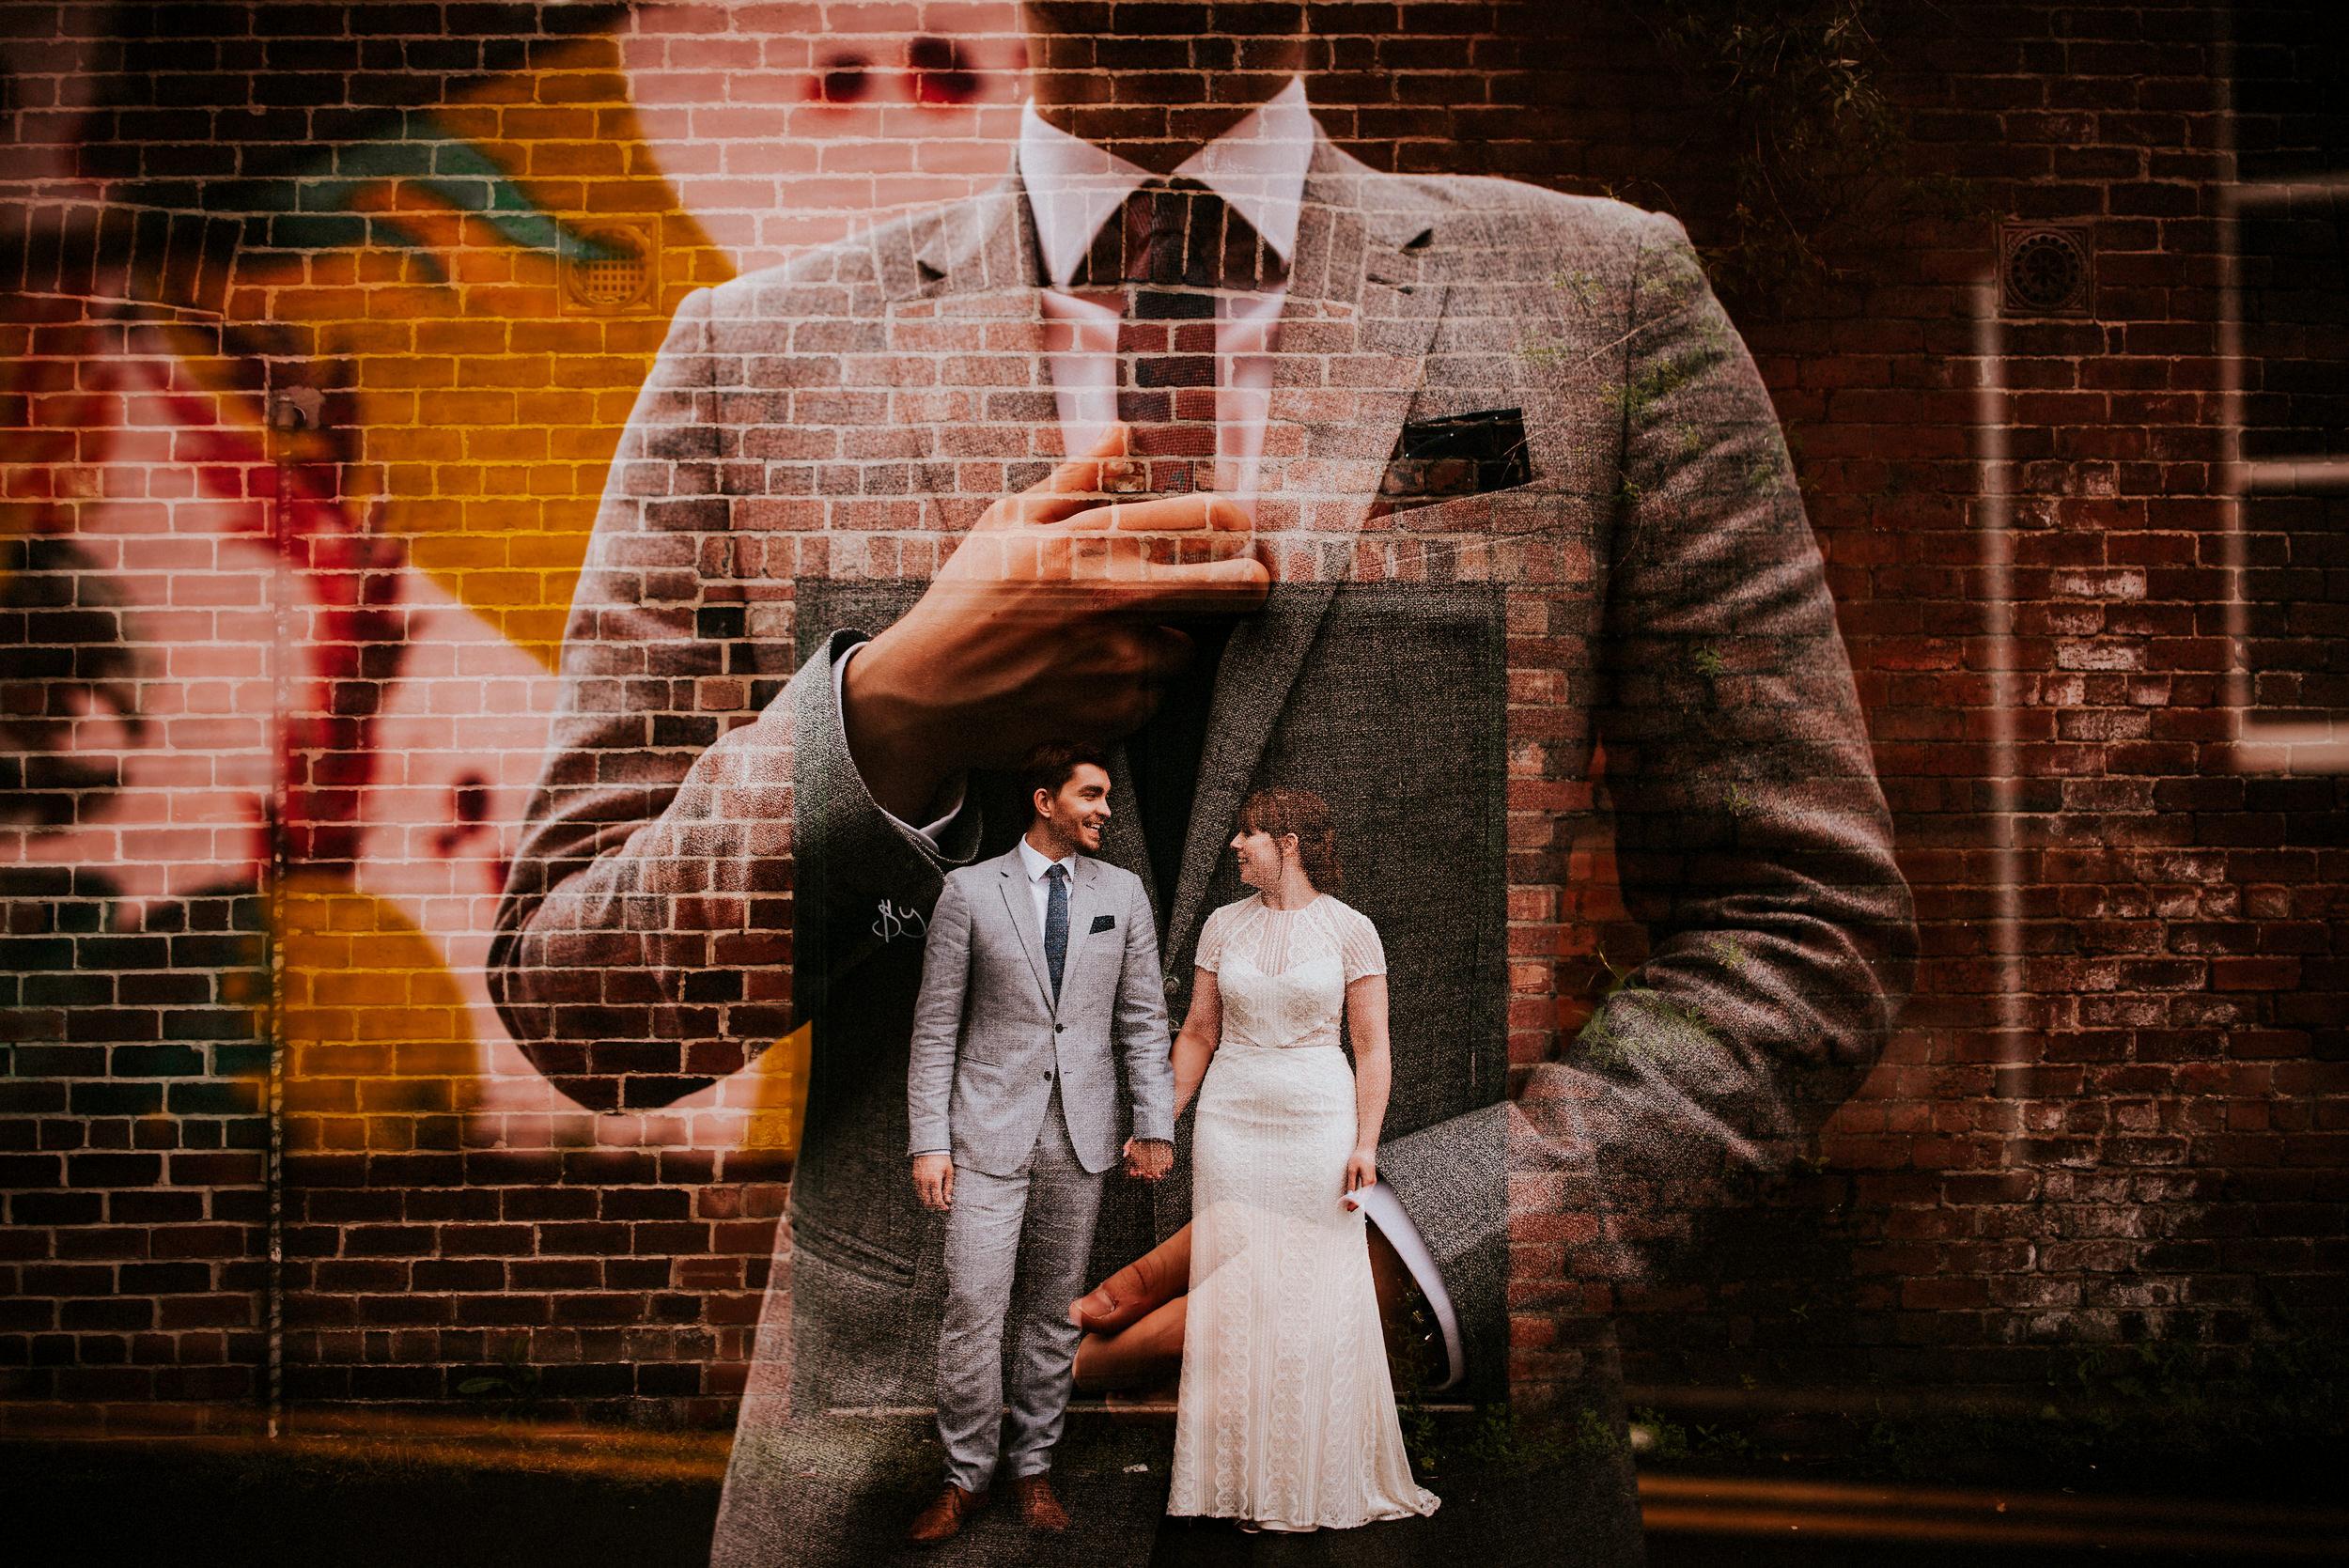 the-tetley-leeds-wedding-photography-shutter-go-click-urban-alternative-wedding-40.jpg